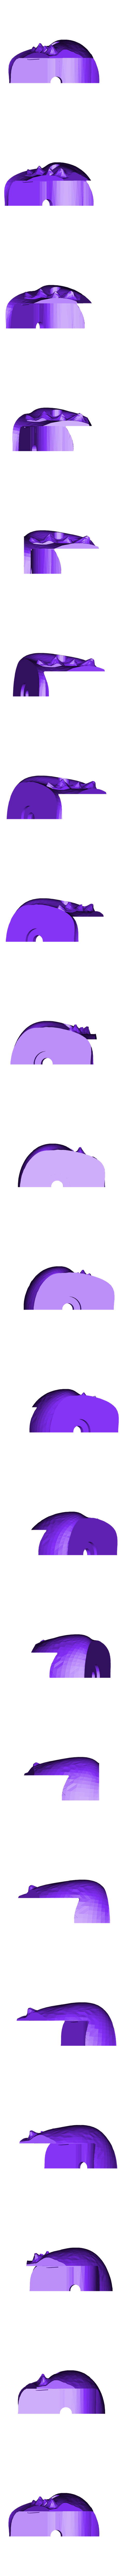 right shoulder pt1.stl Download free STL file GADGET the robotic Gremlin • 3D printing object, atarka3